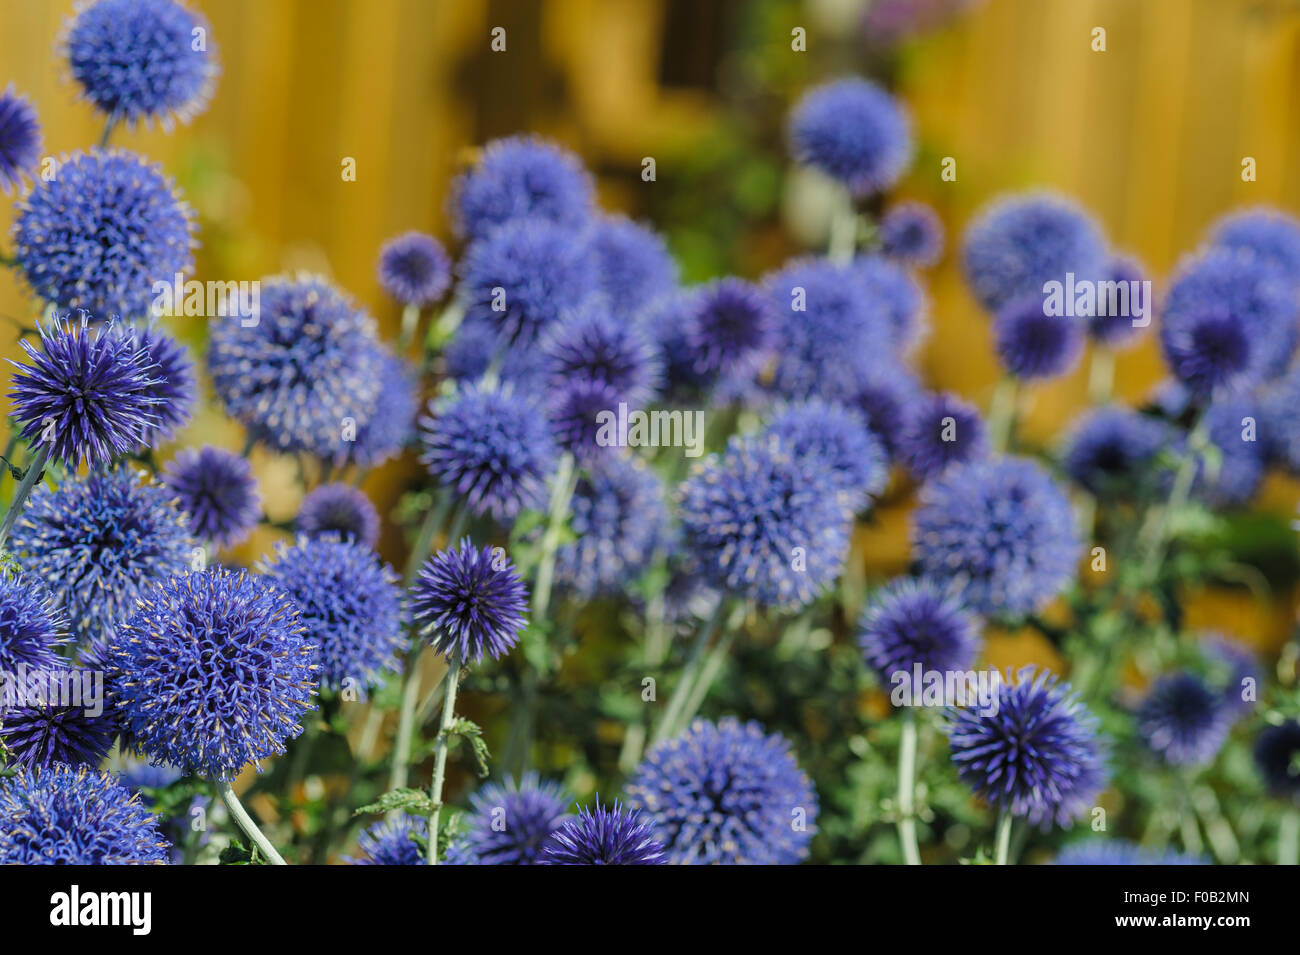 Echinops Veitch's Blue, Globe Thistle. - Stock Image